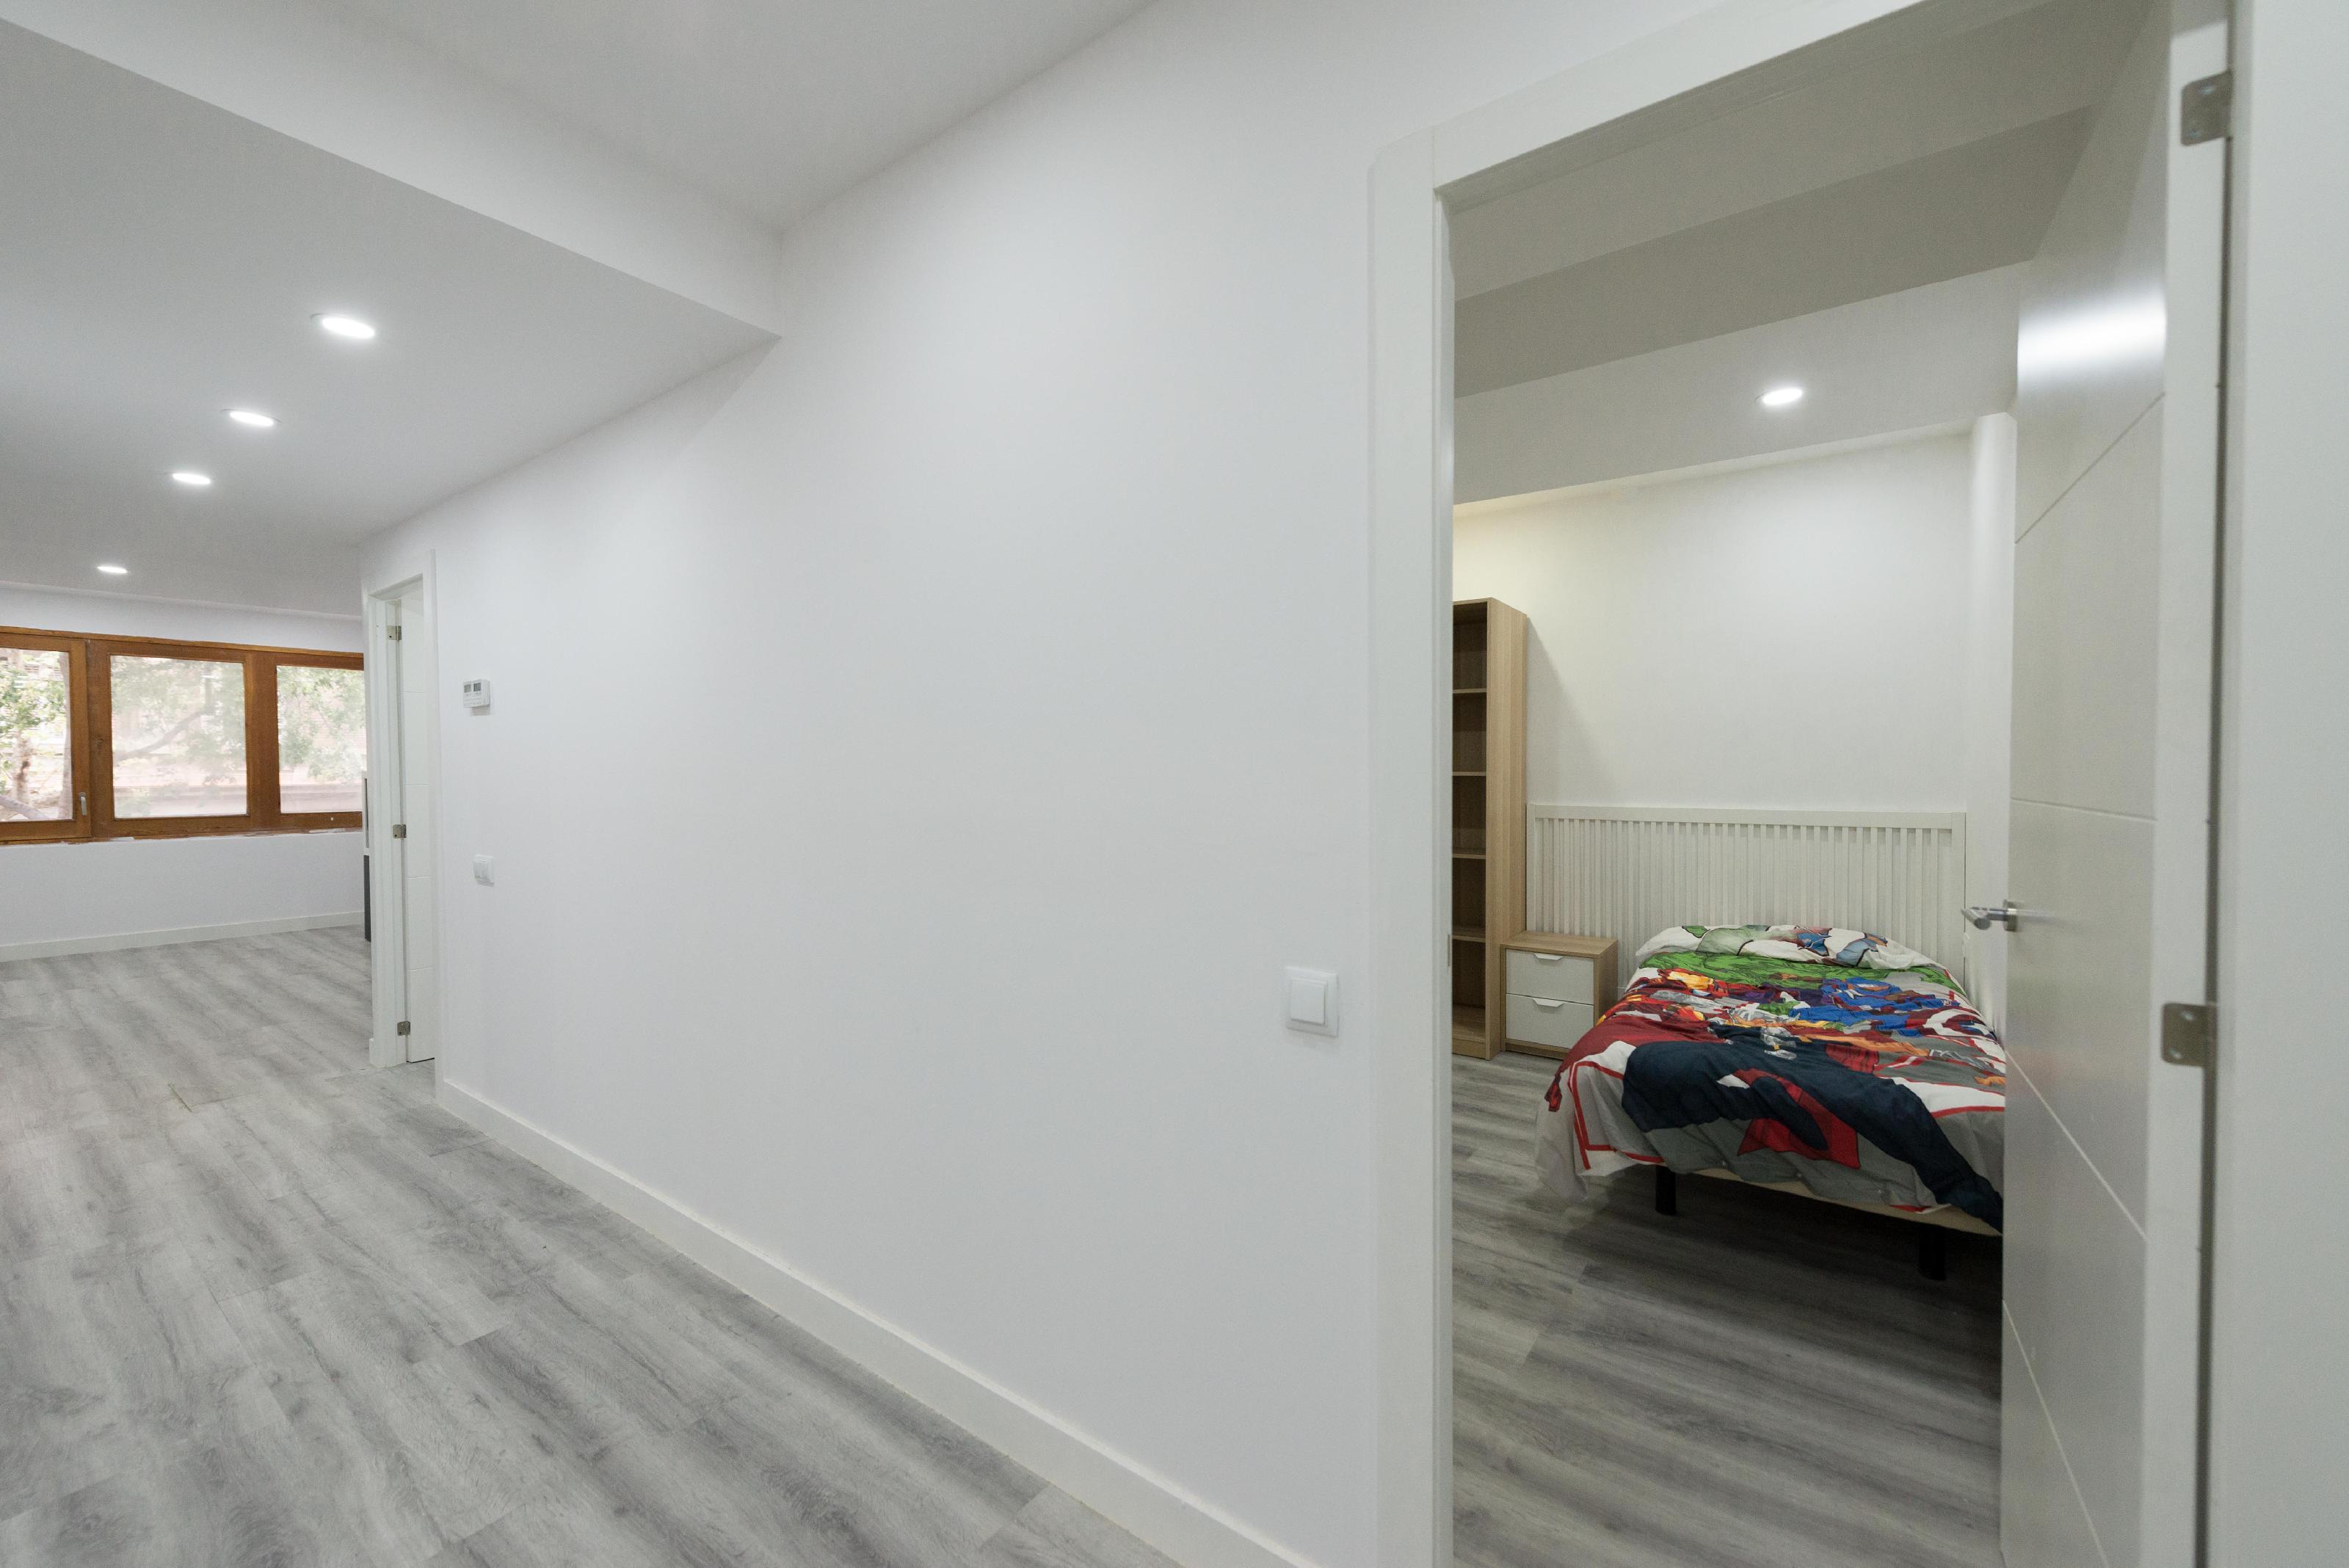 242980 Flat for sale in Eixample, Sagrada Familia 10